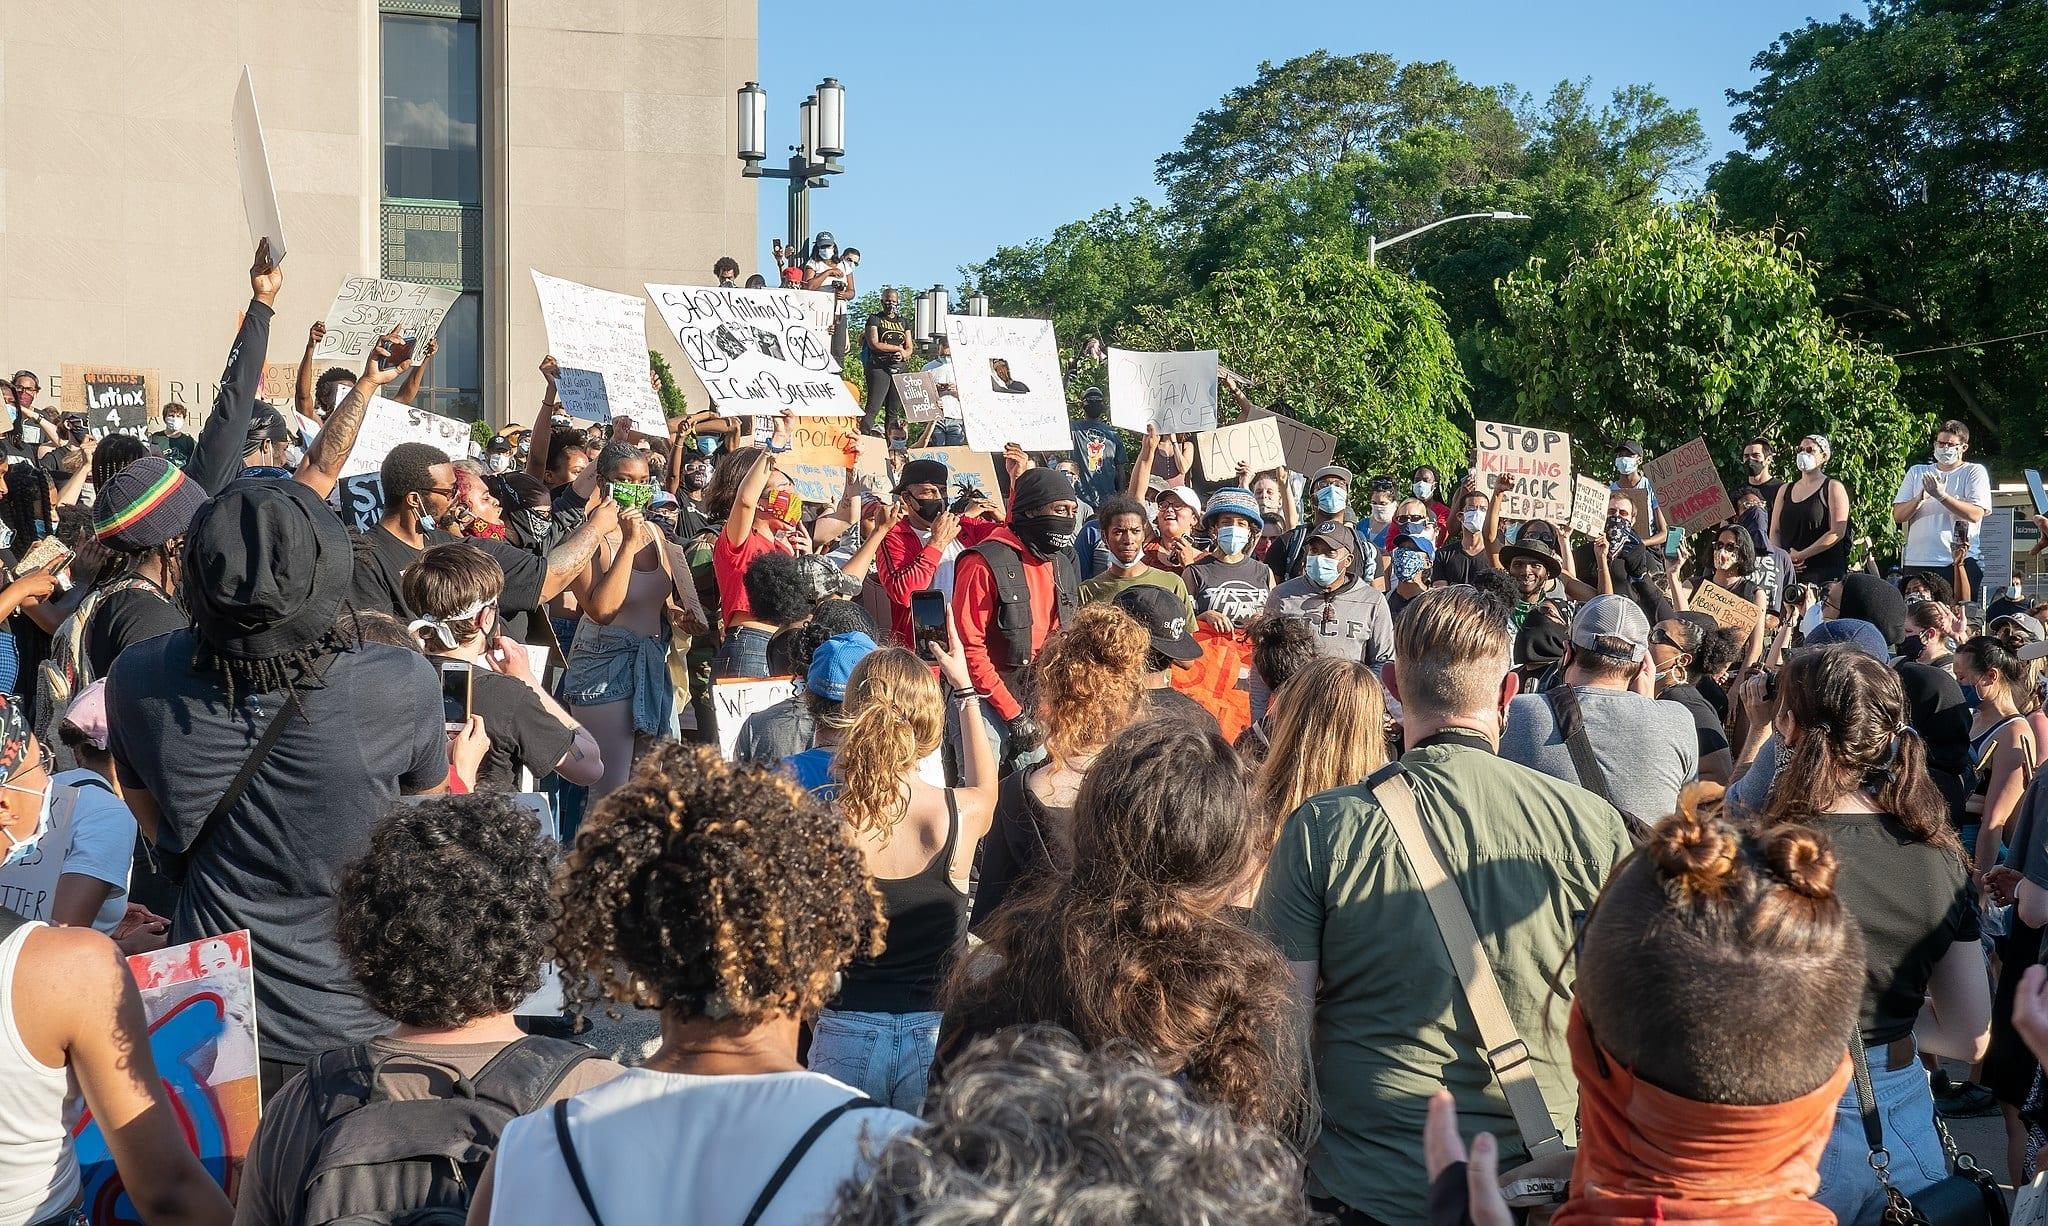 The Protesters and Prison Labor